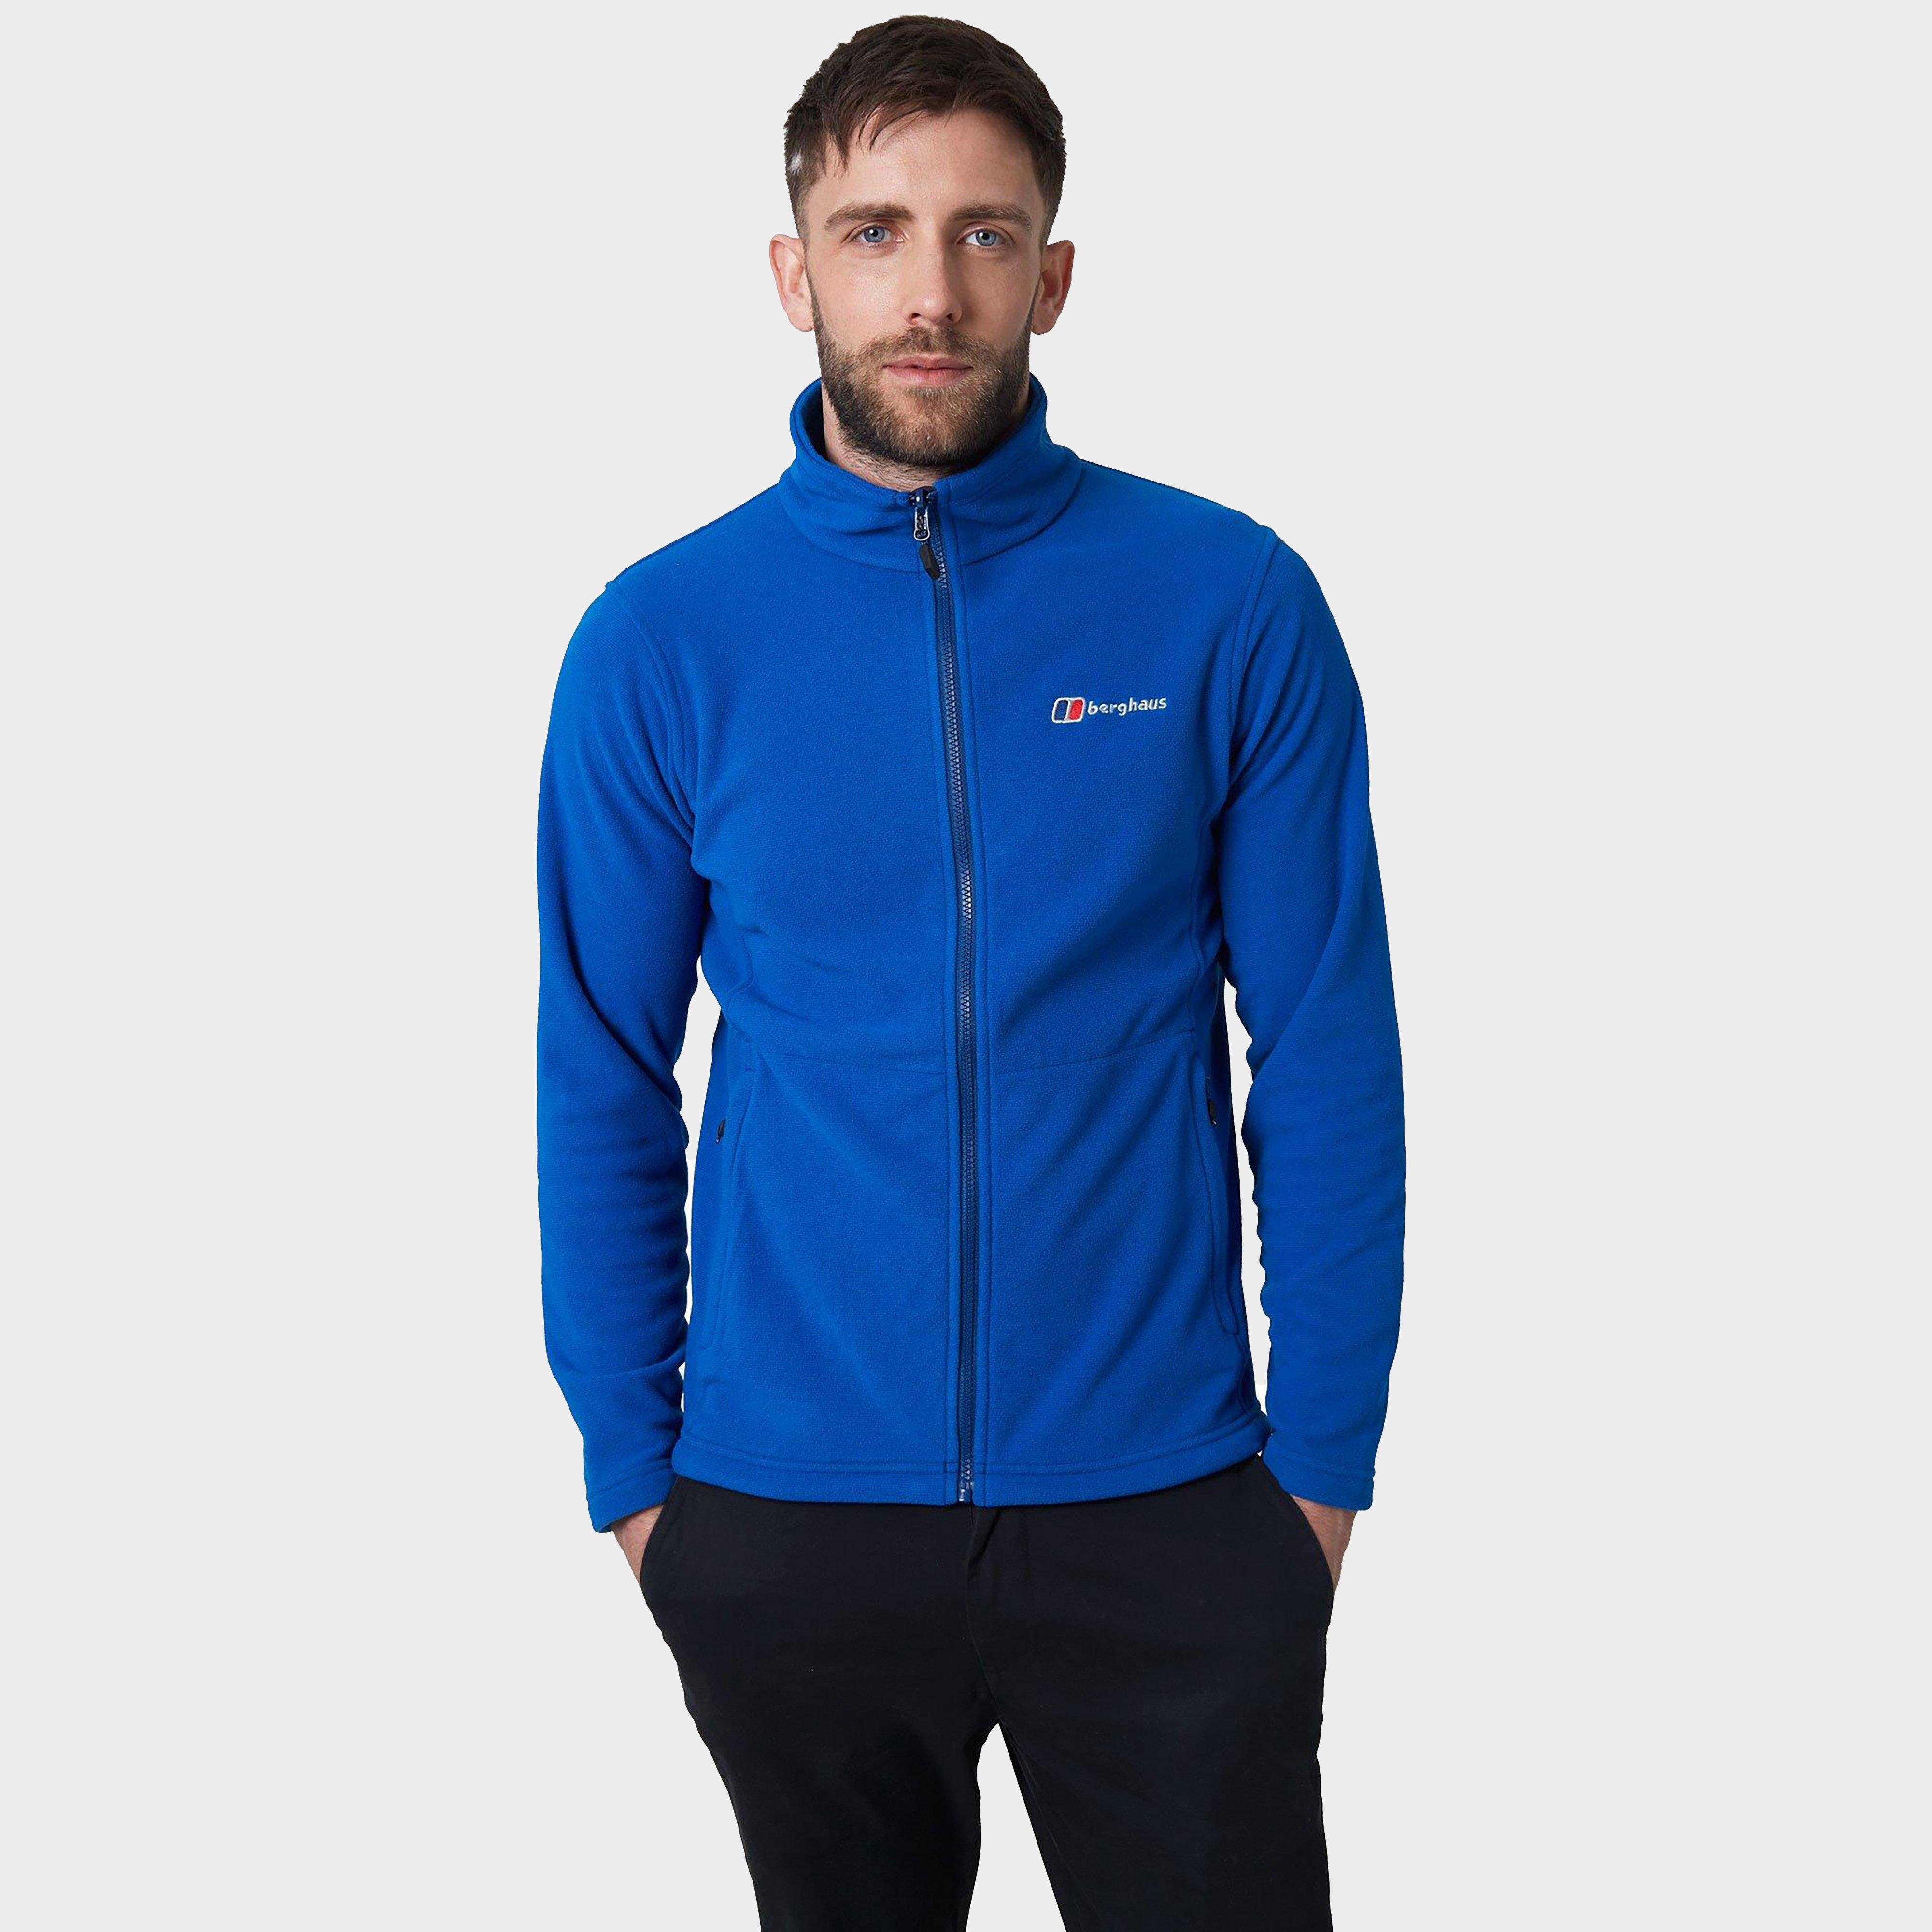 New Berghaus Men's Kedron Fleece Jacket